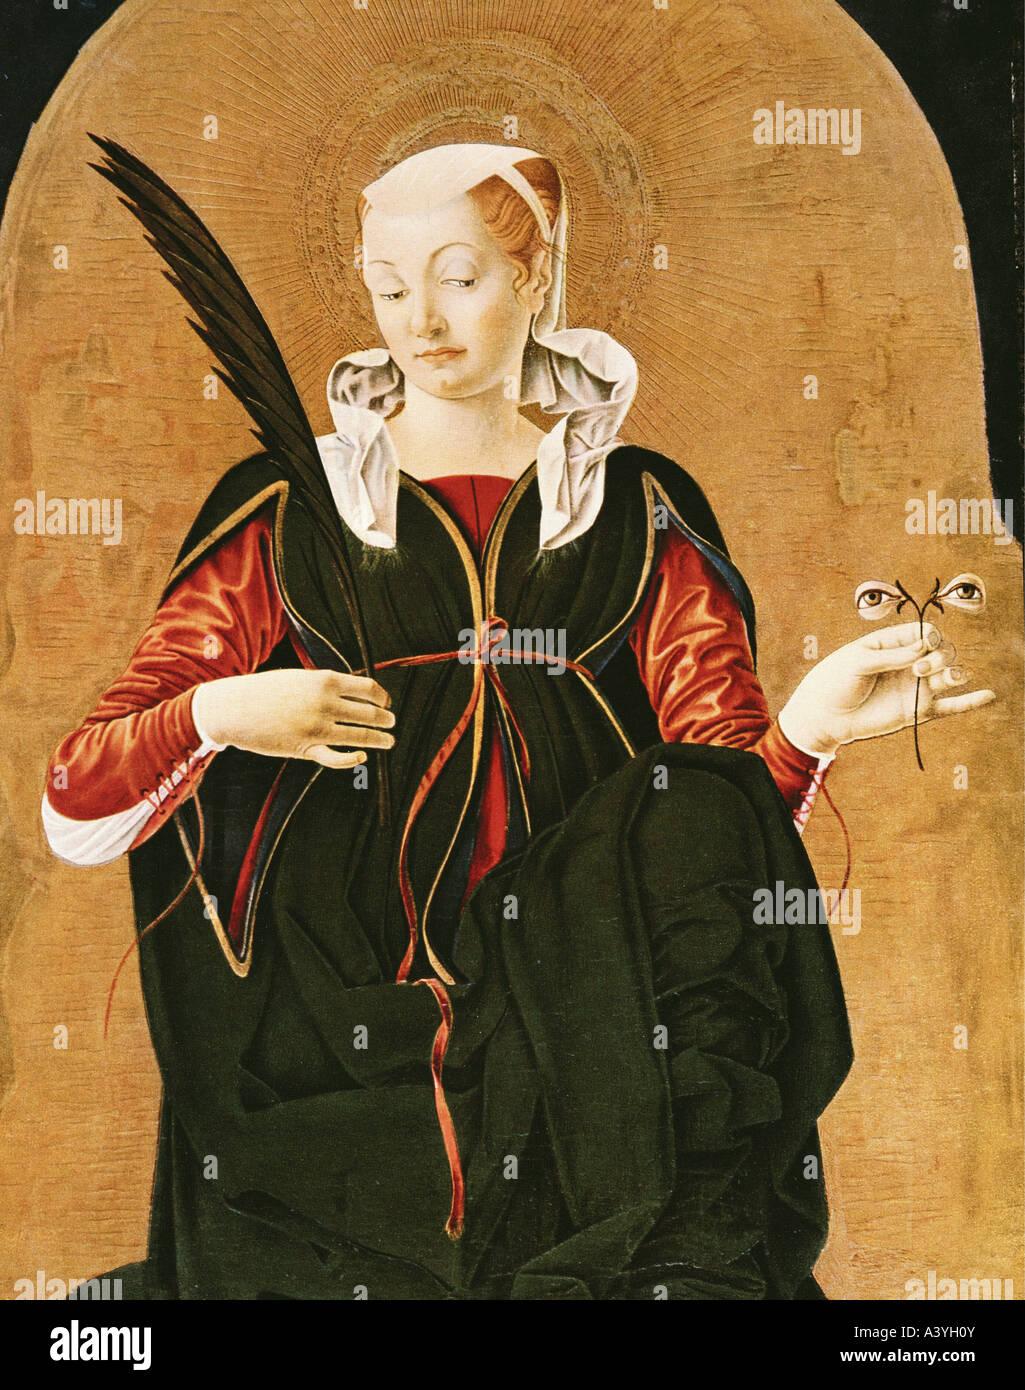 """Bellas Artes, Francesco del Cossa, (circa 1435 - circa 1477), pintura, 'Saint Lucy"", 1474, óleo Imagen De Stock"